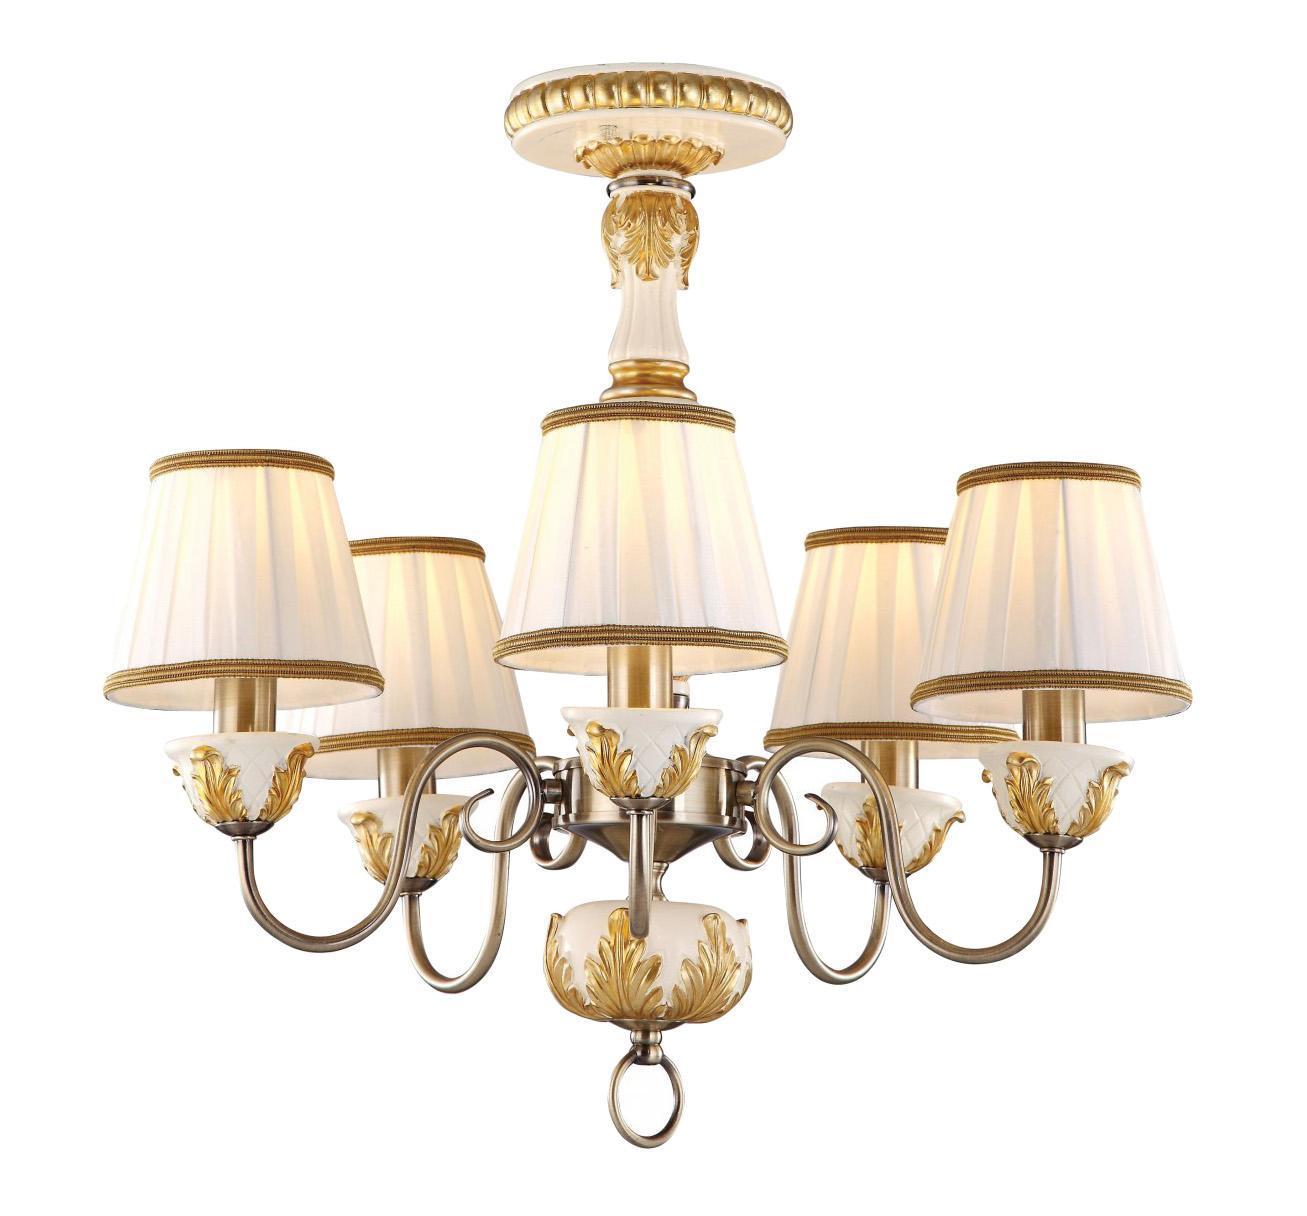 Люстра Arte lamp A9570pl-5wg люстра на штанге arte lamp benessere a9570pl 5wg